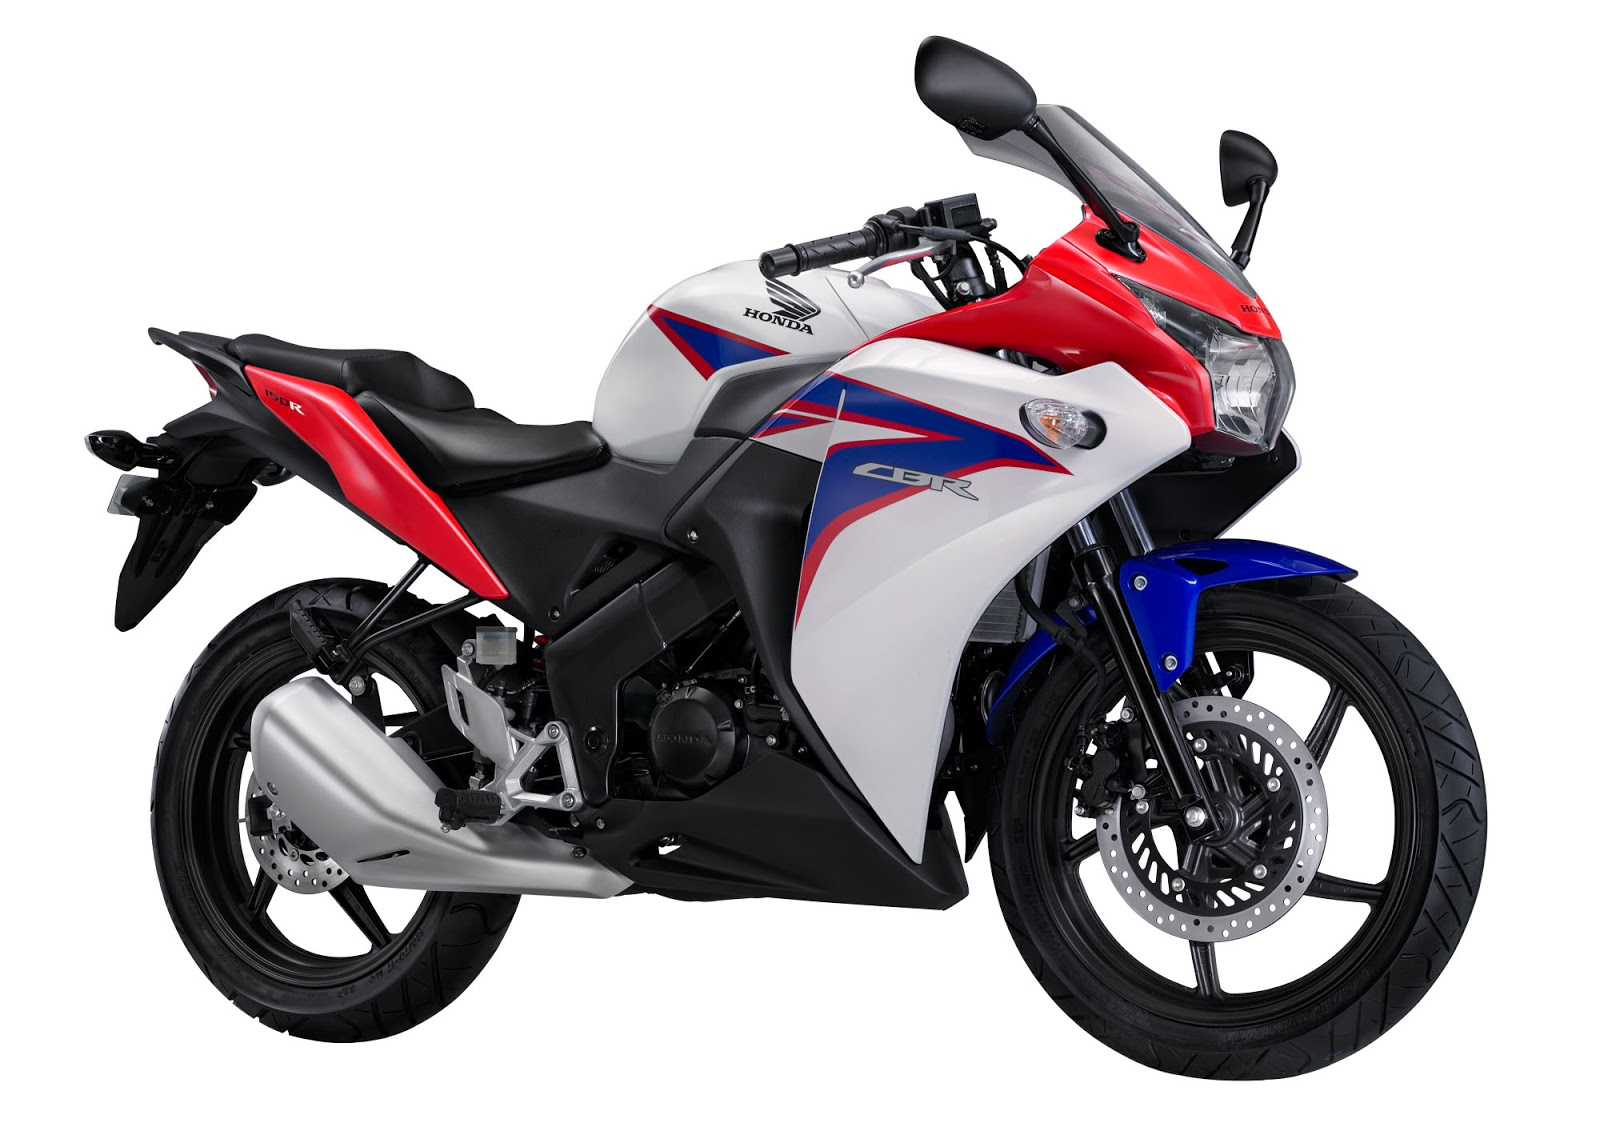 Honda CBR 150 Price